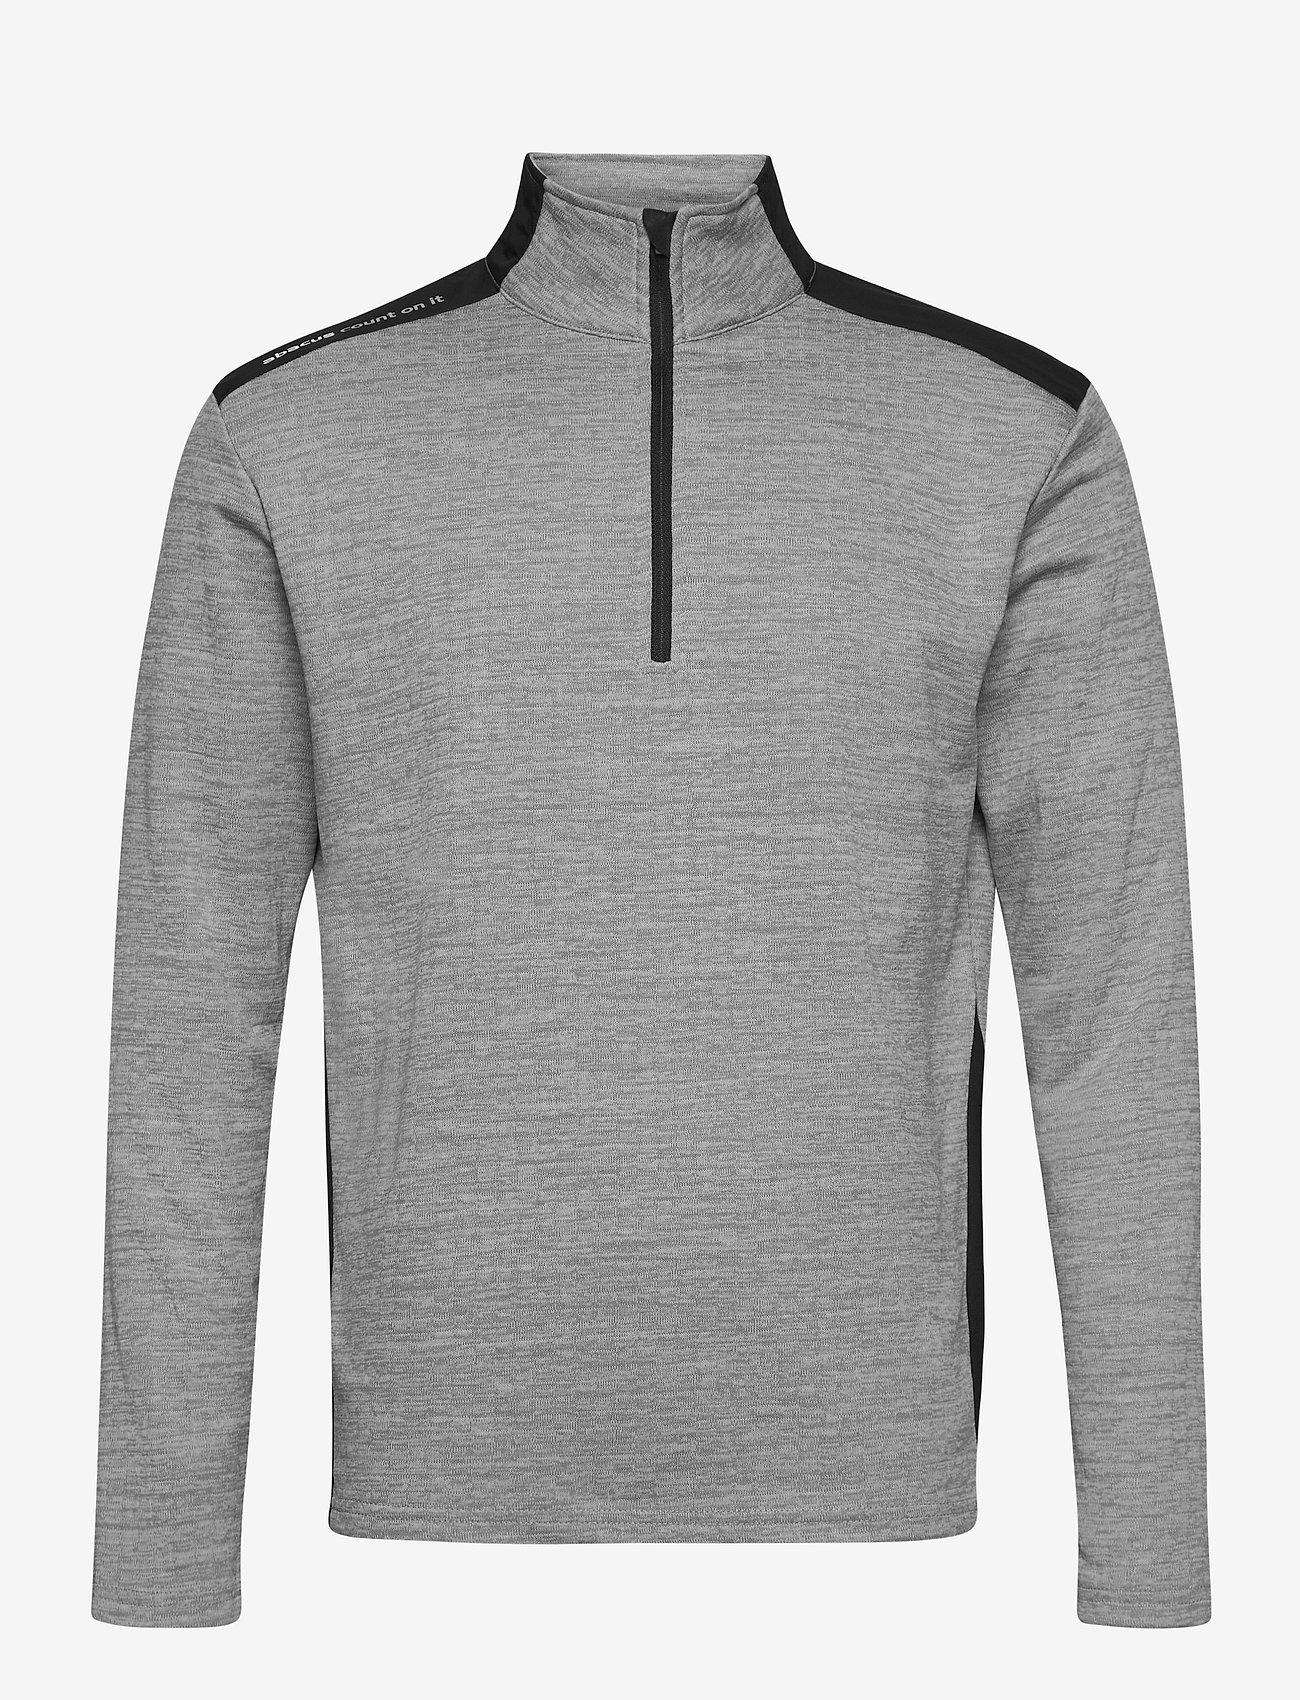 Abacus - Mens Sunningdale halfzip - golf jackets - lt.grey/black - 0